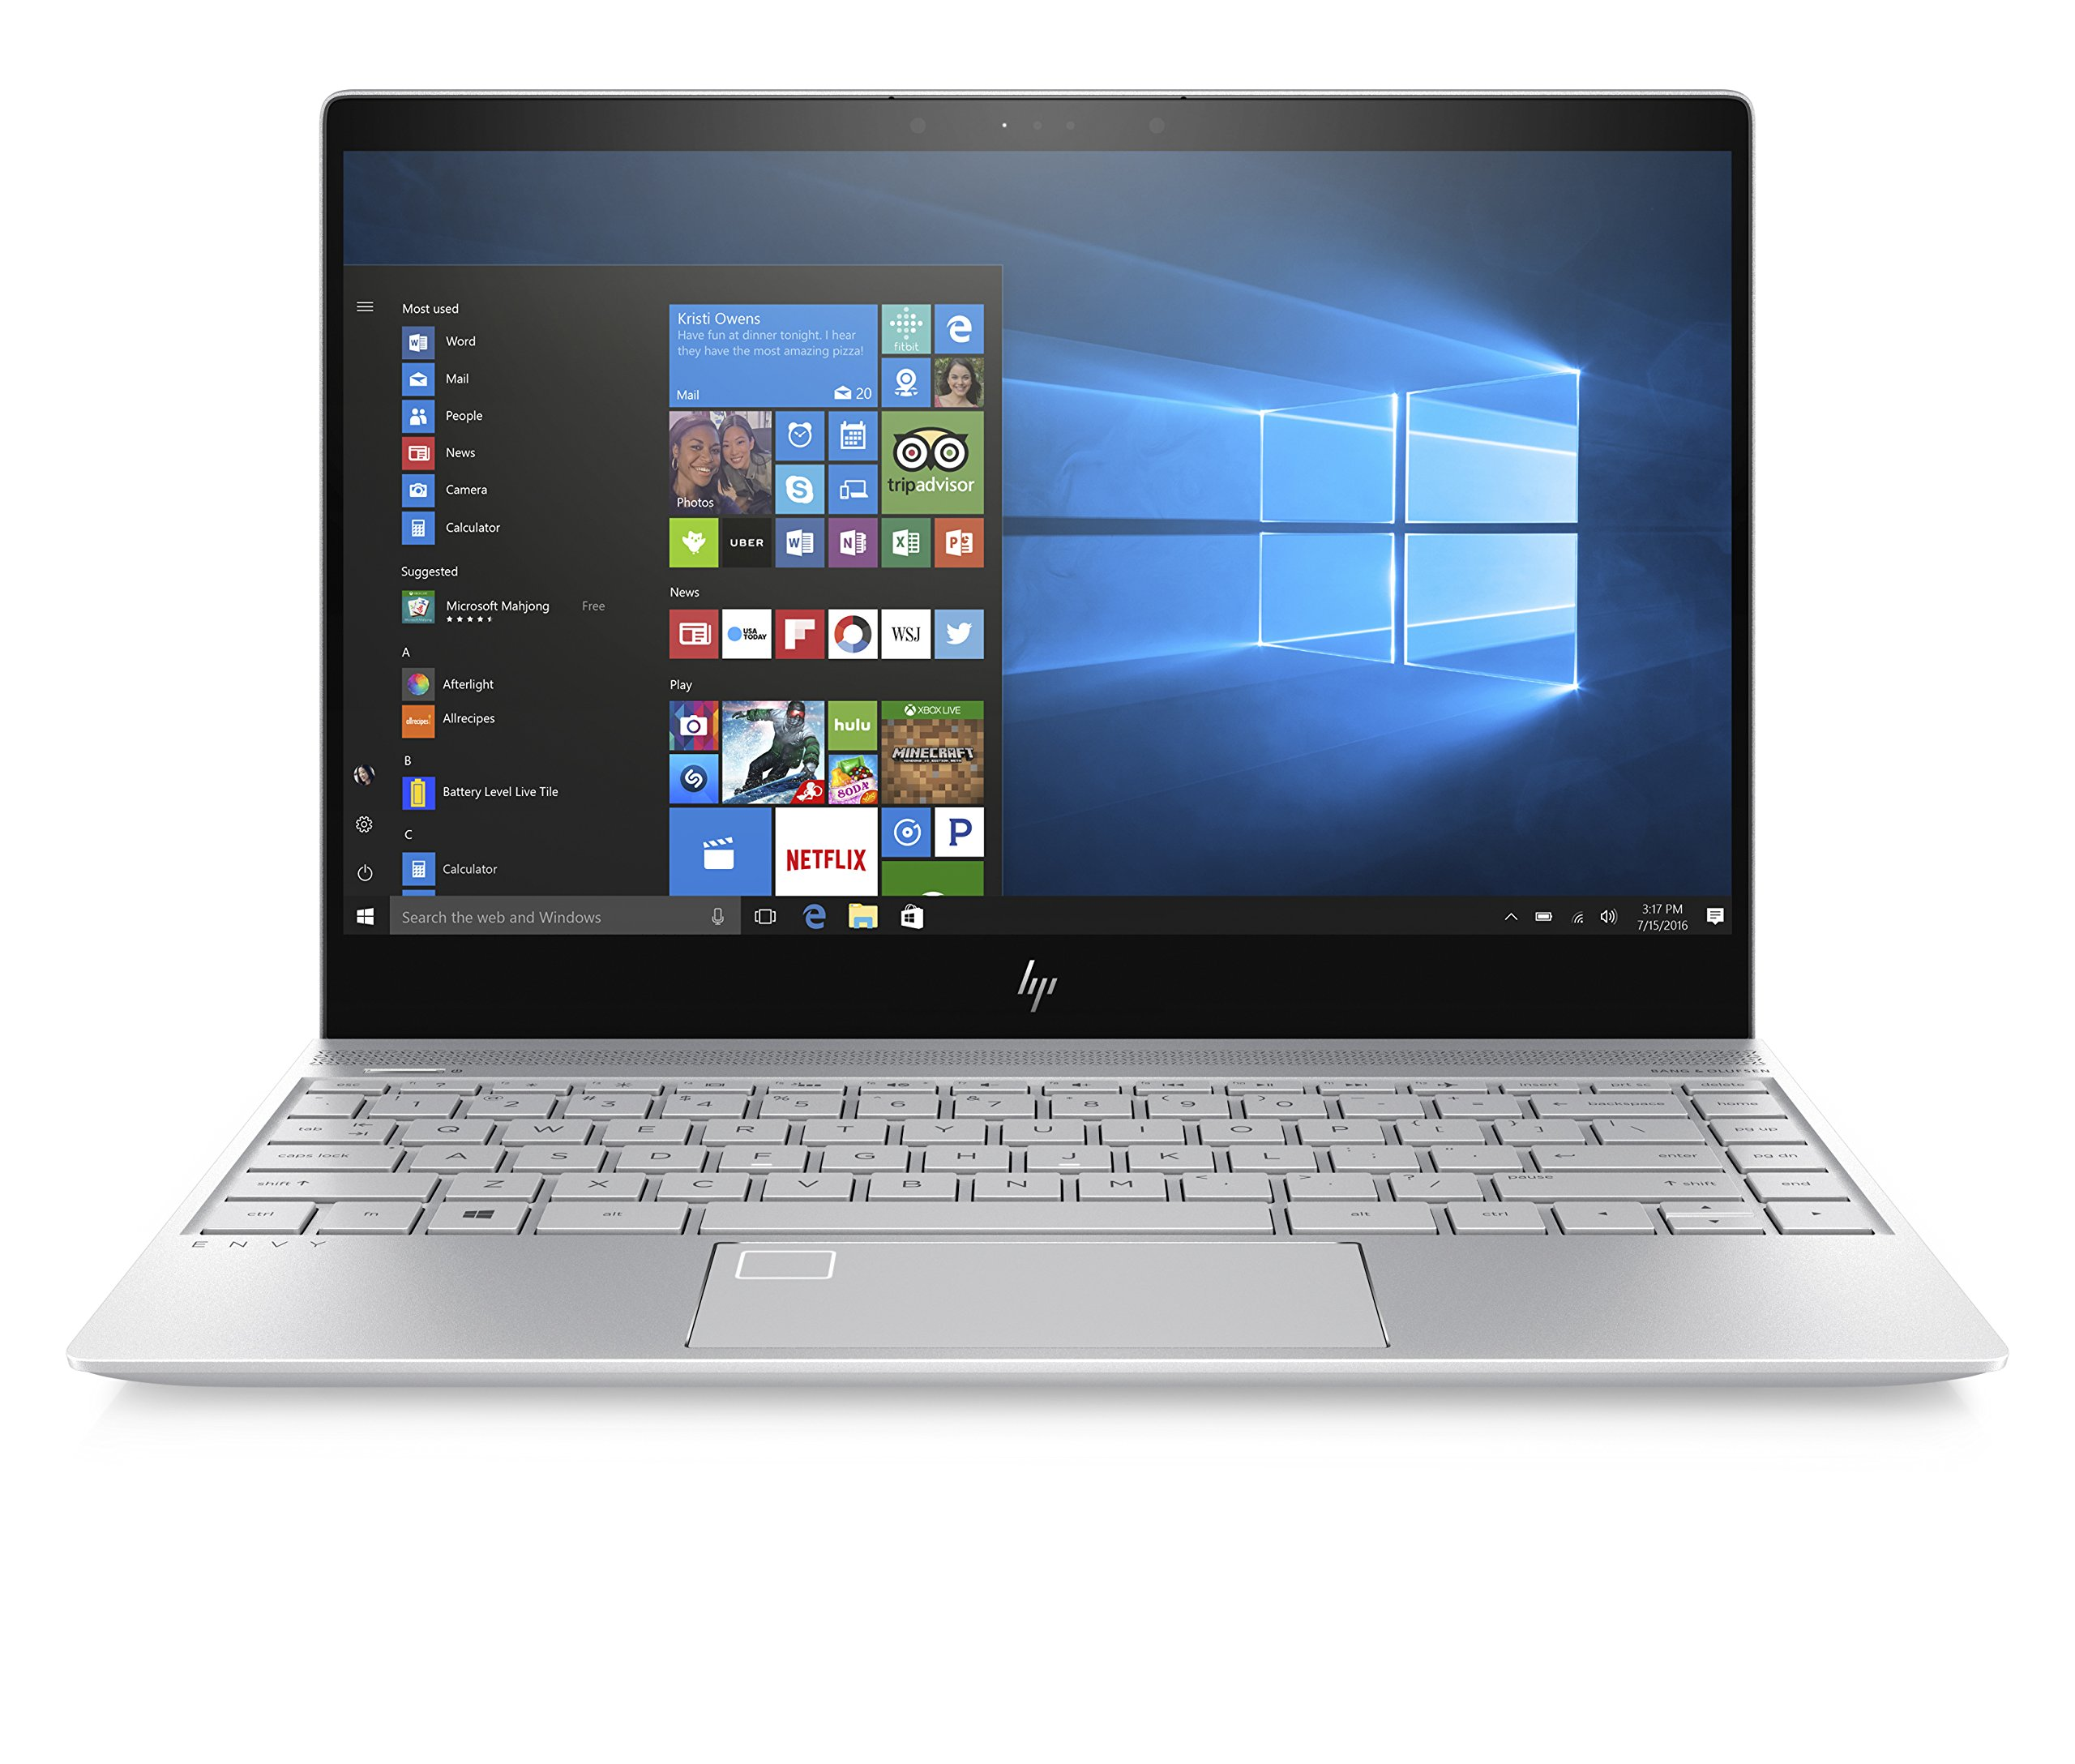 HP ENVY 13-inch Laptop, Intel Core i7-7500U, 8GB RAM, 256GB solid-state drive, Windows 10 (13-ad010nr, Silver)